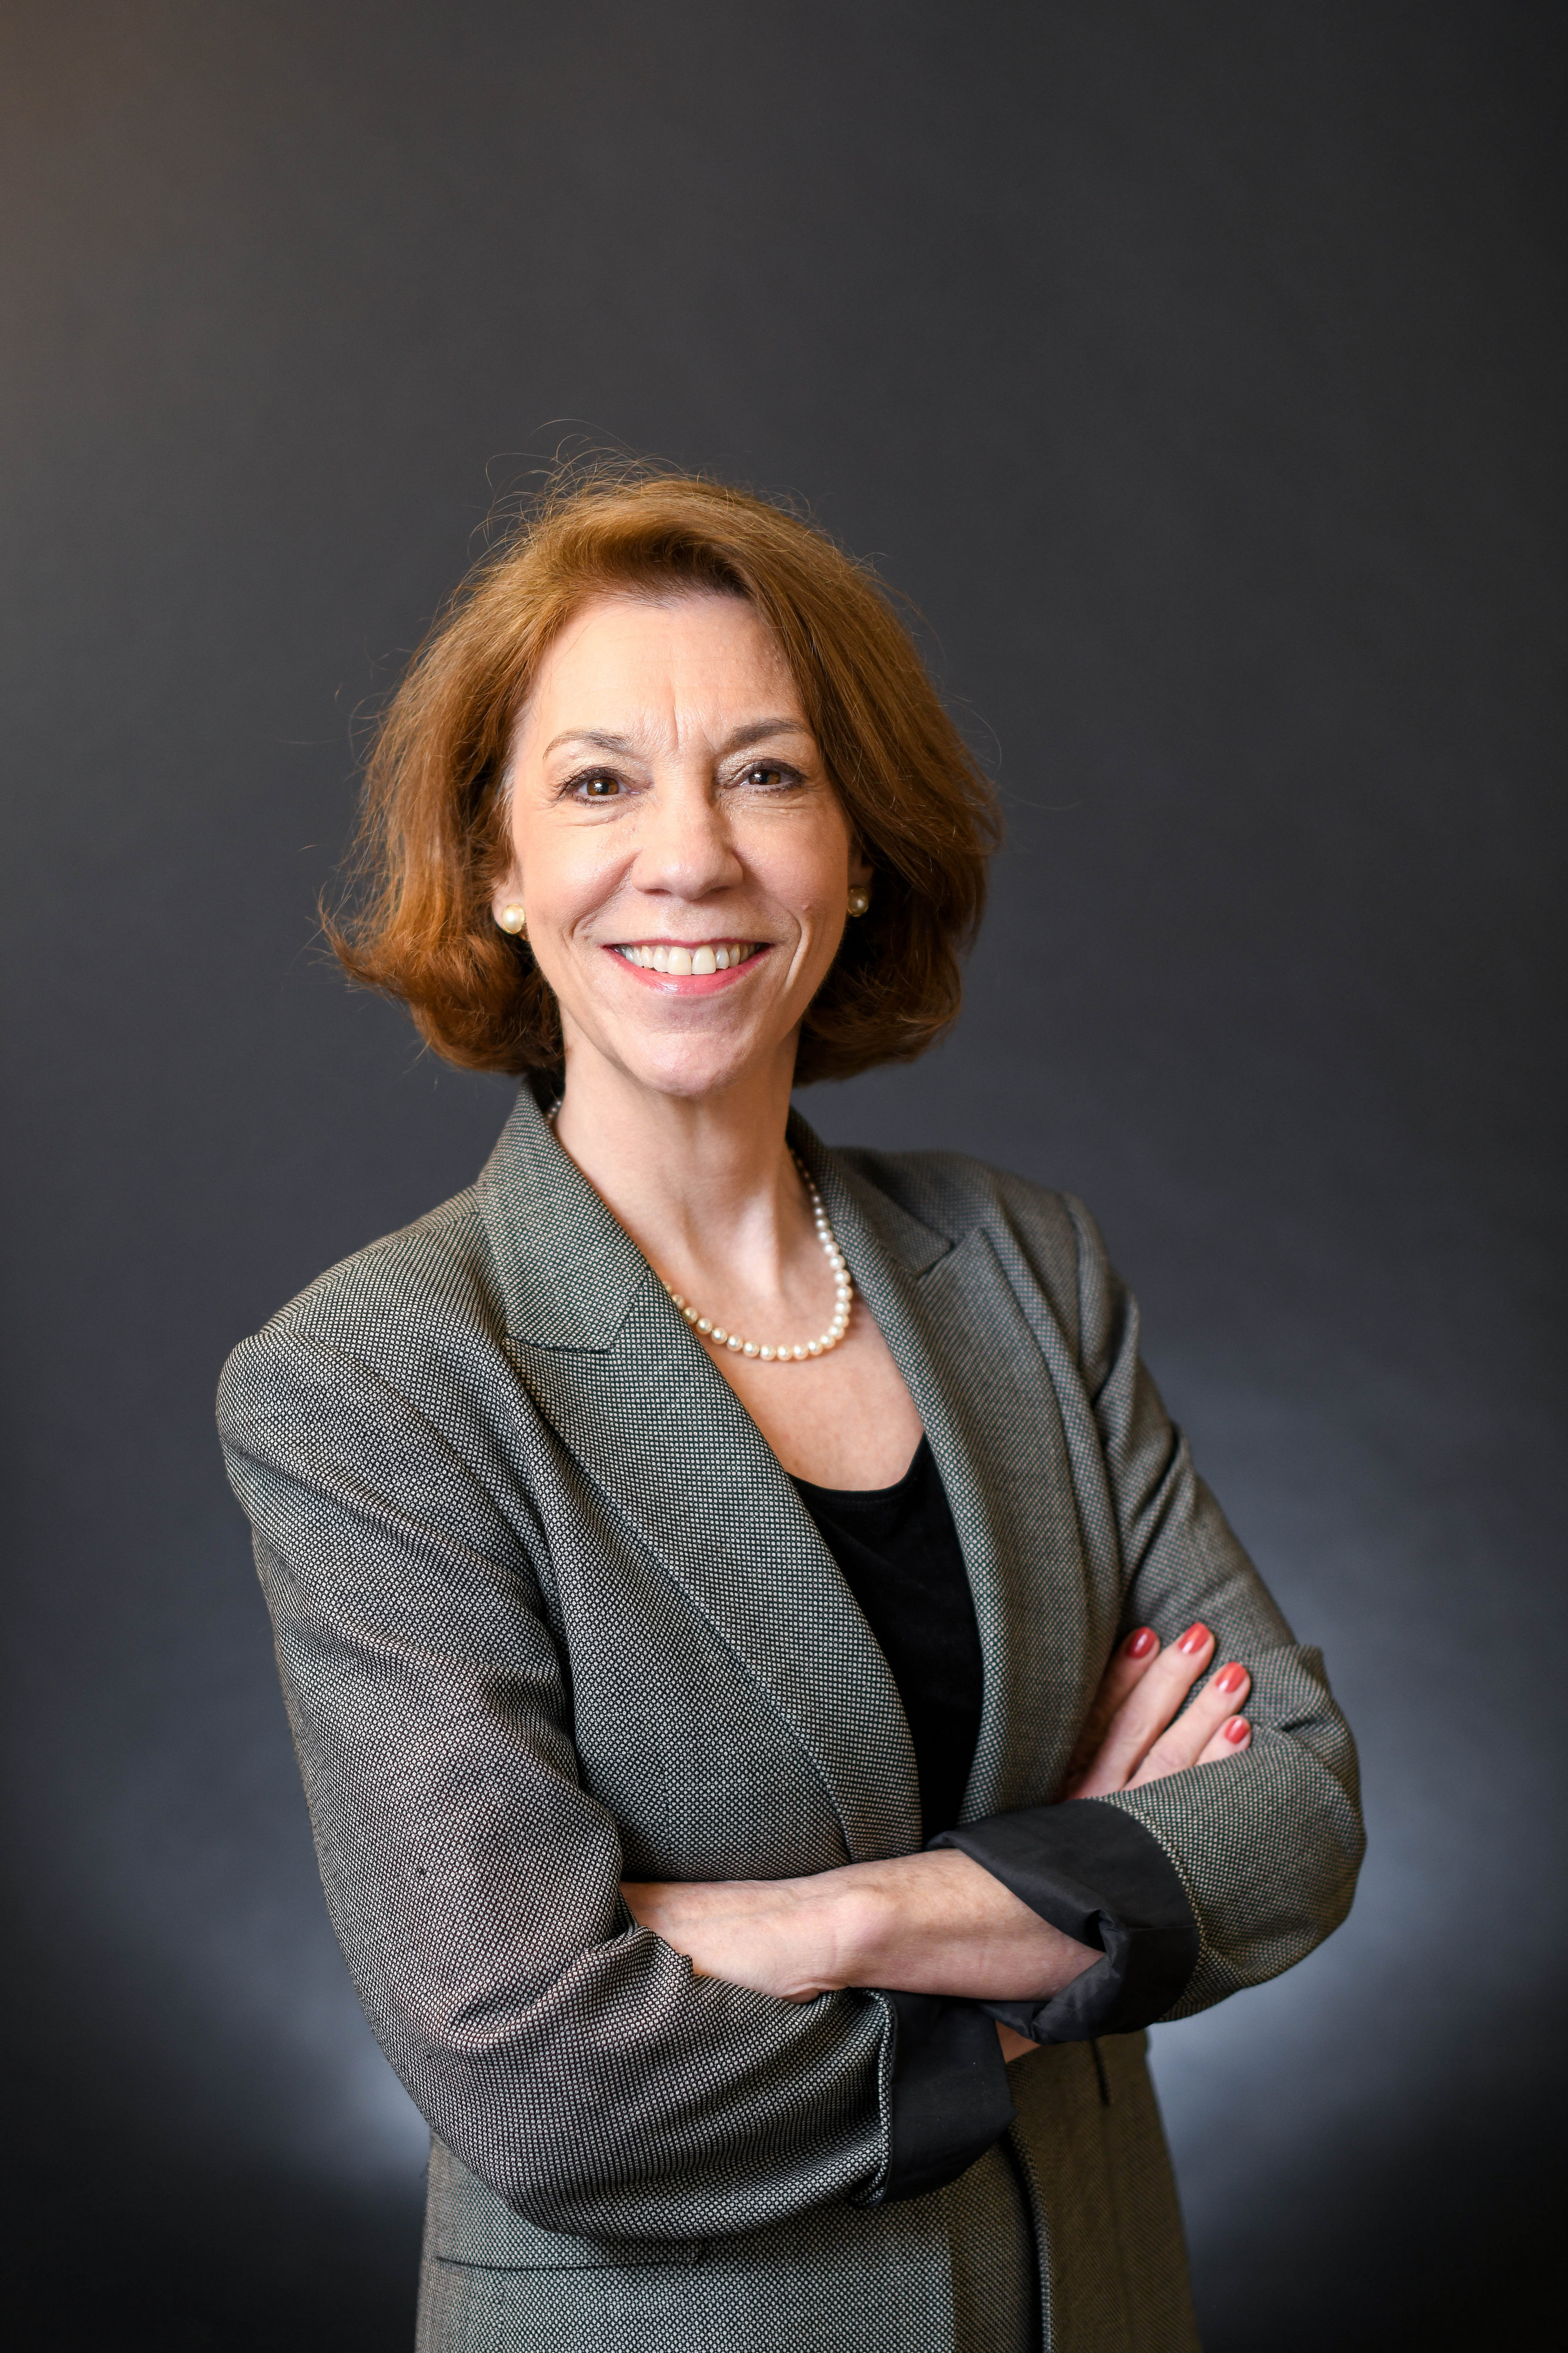 Sarah Wattenberg